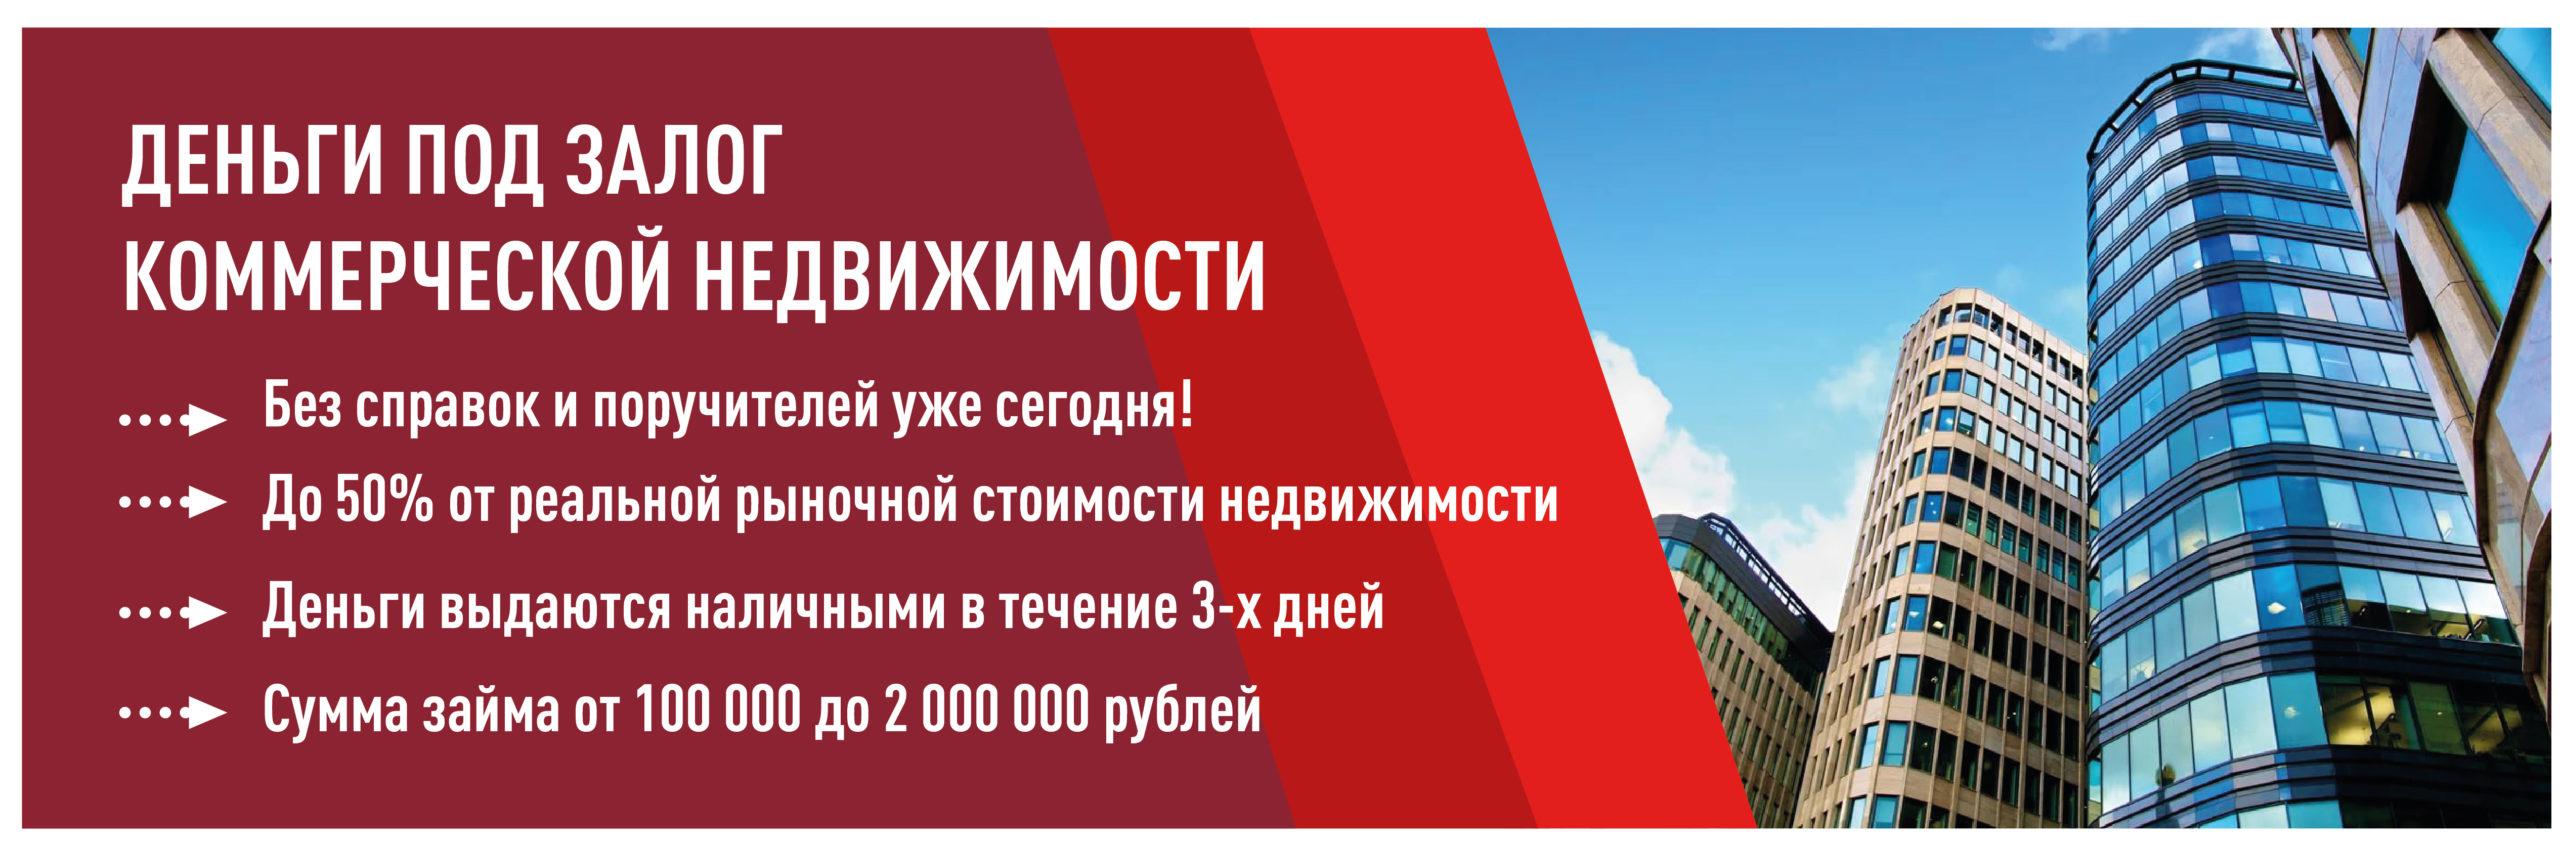 Деньги под залог недвижимости оквэд автосалон фав в москве